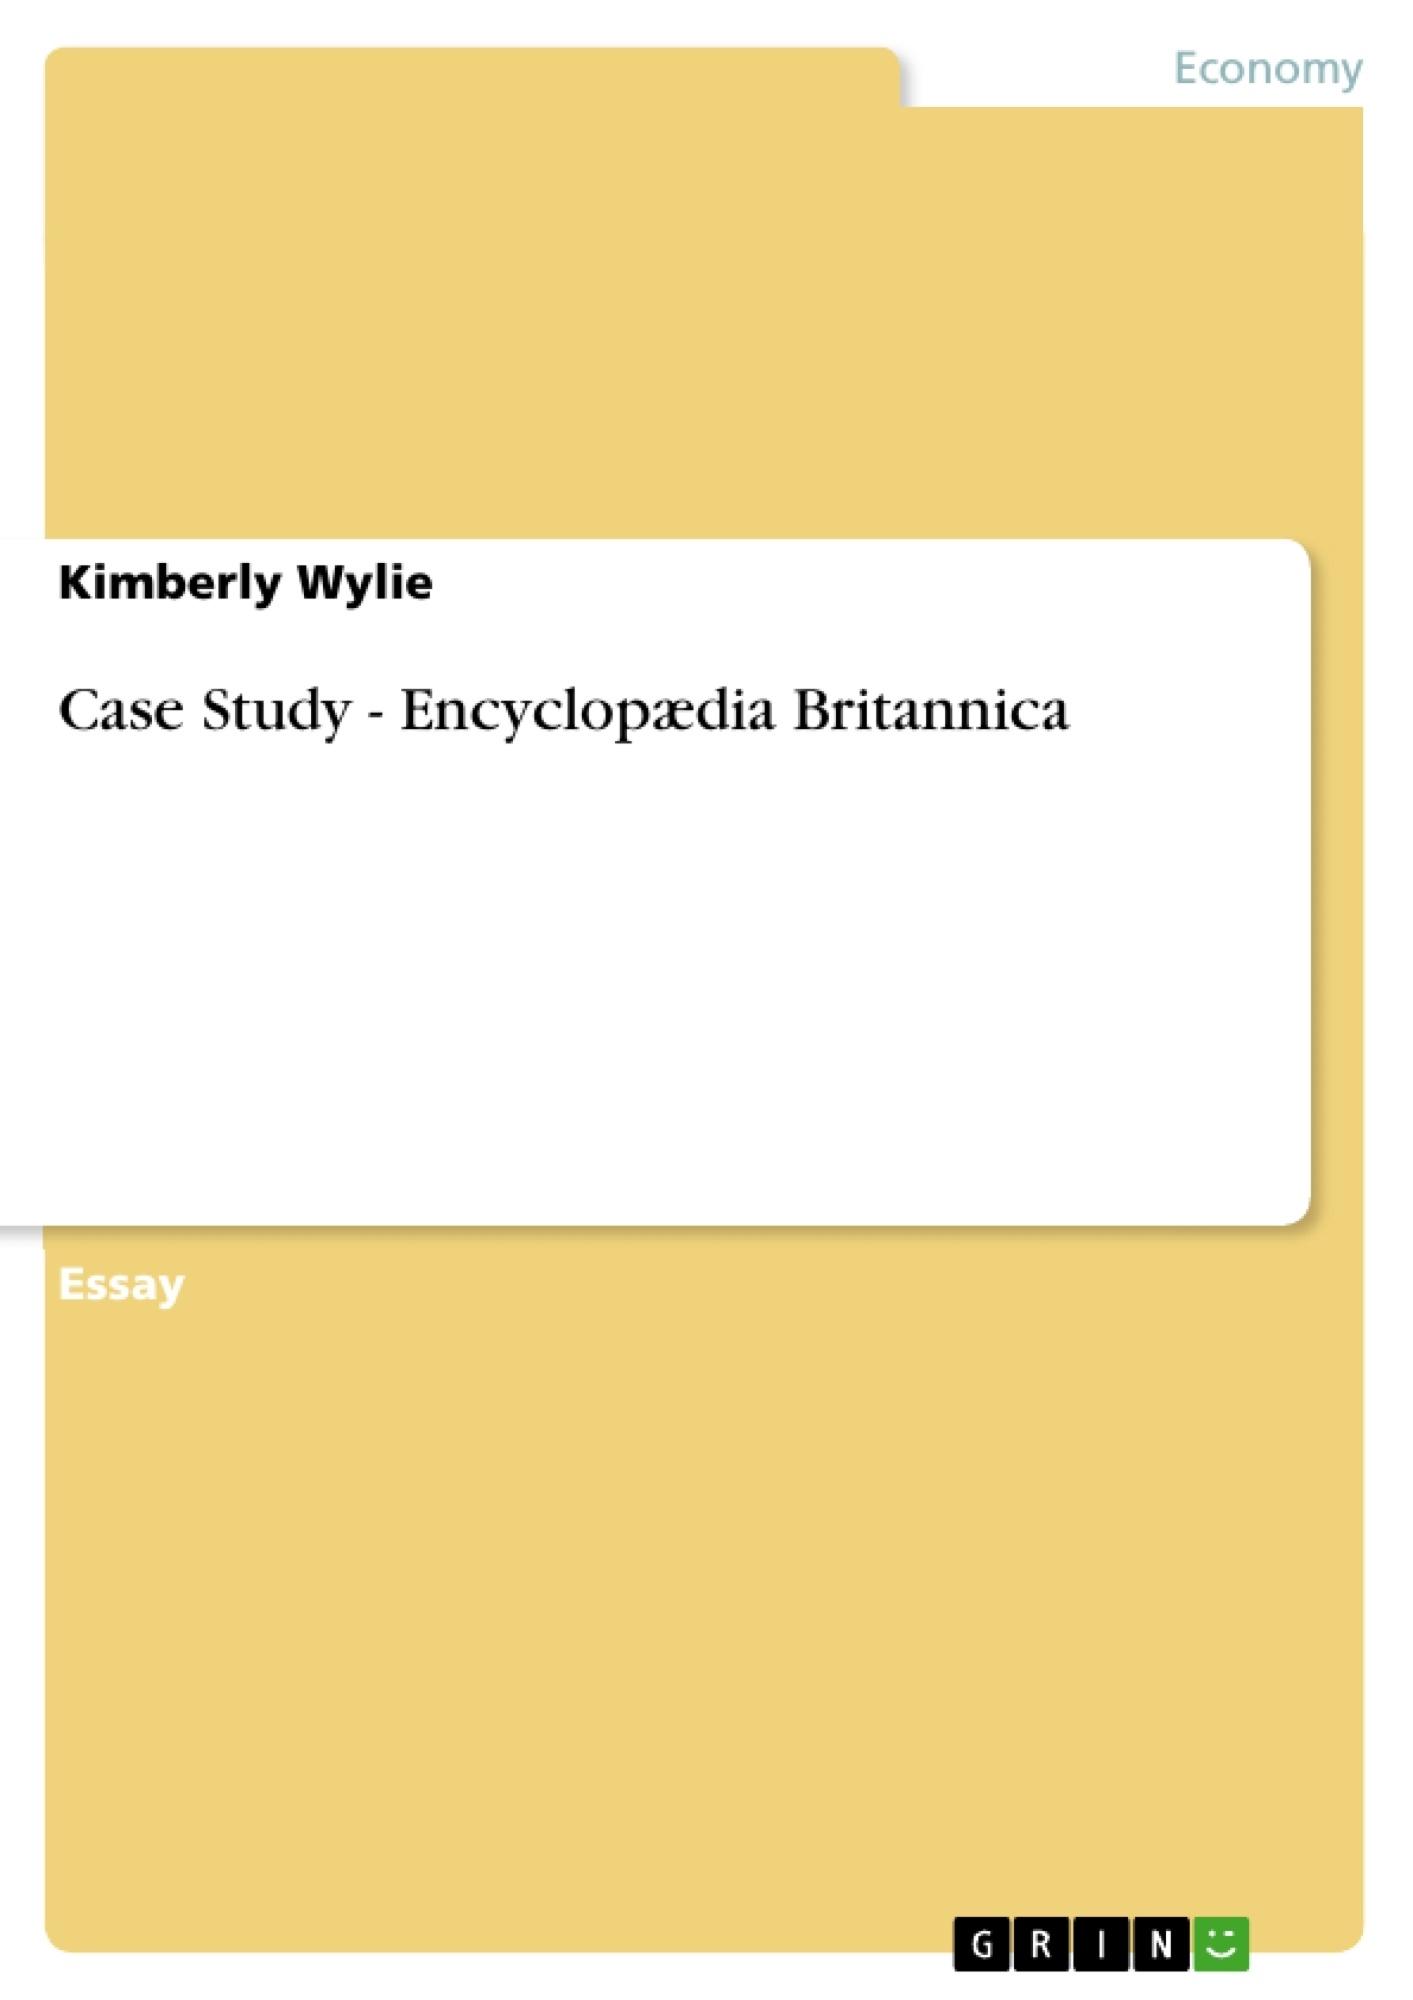 Title: Case Study - Encyclopædia Britannica